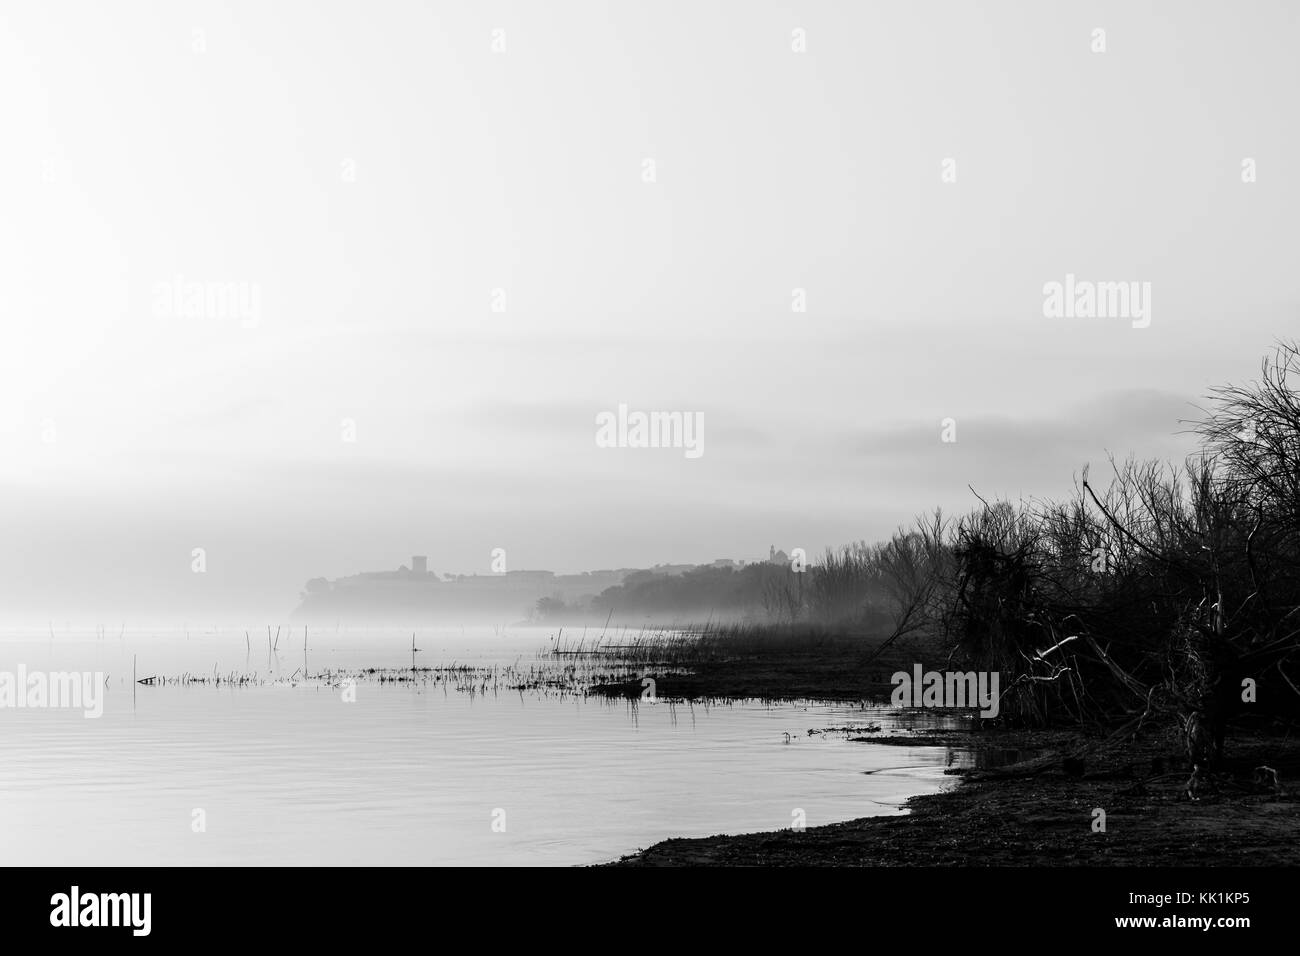 Beautiful view of Trasimeno  lake (Umbria) shore at dawn, with Castiglione del Lago town in the mist in the background - Stock Image